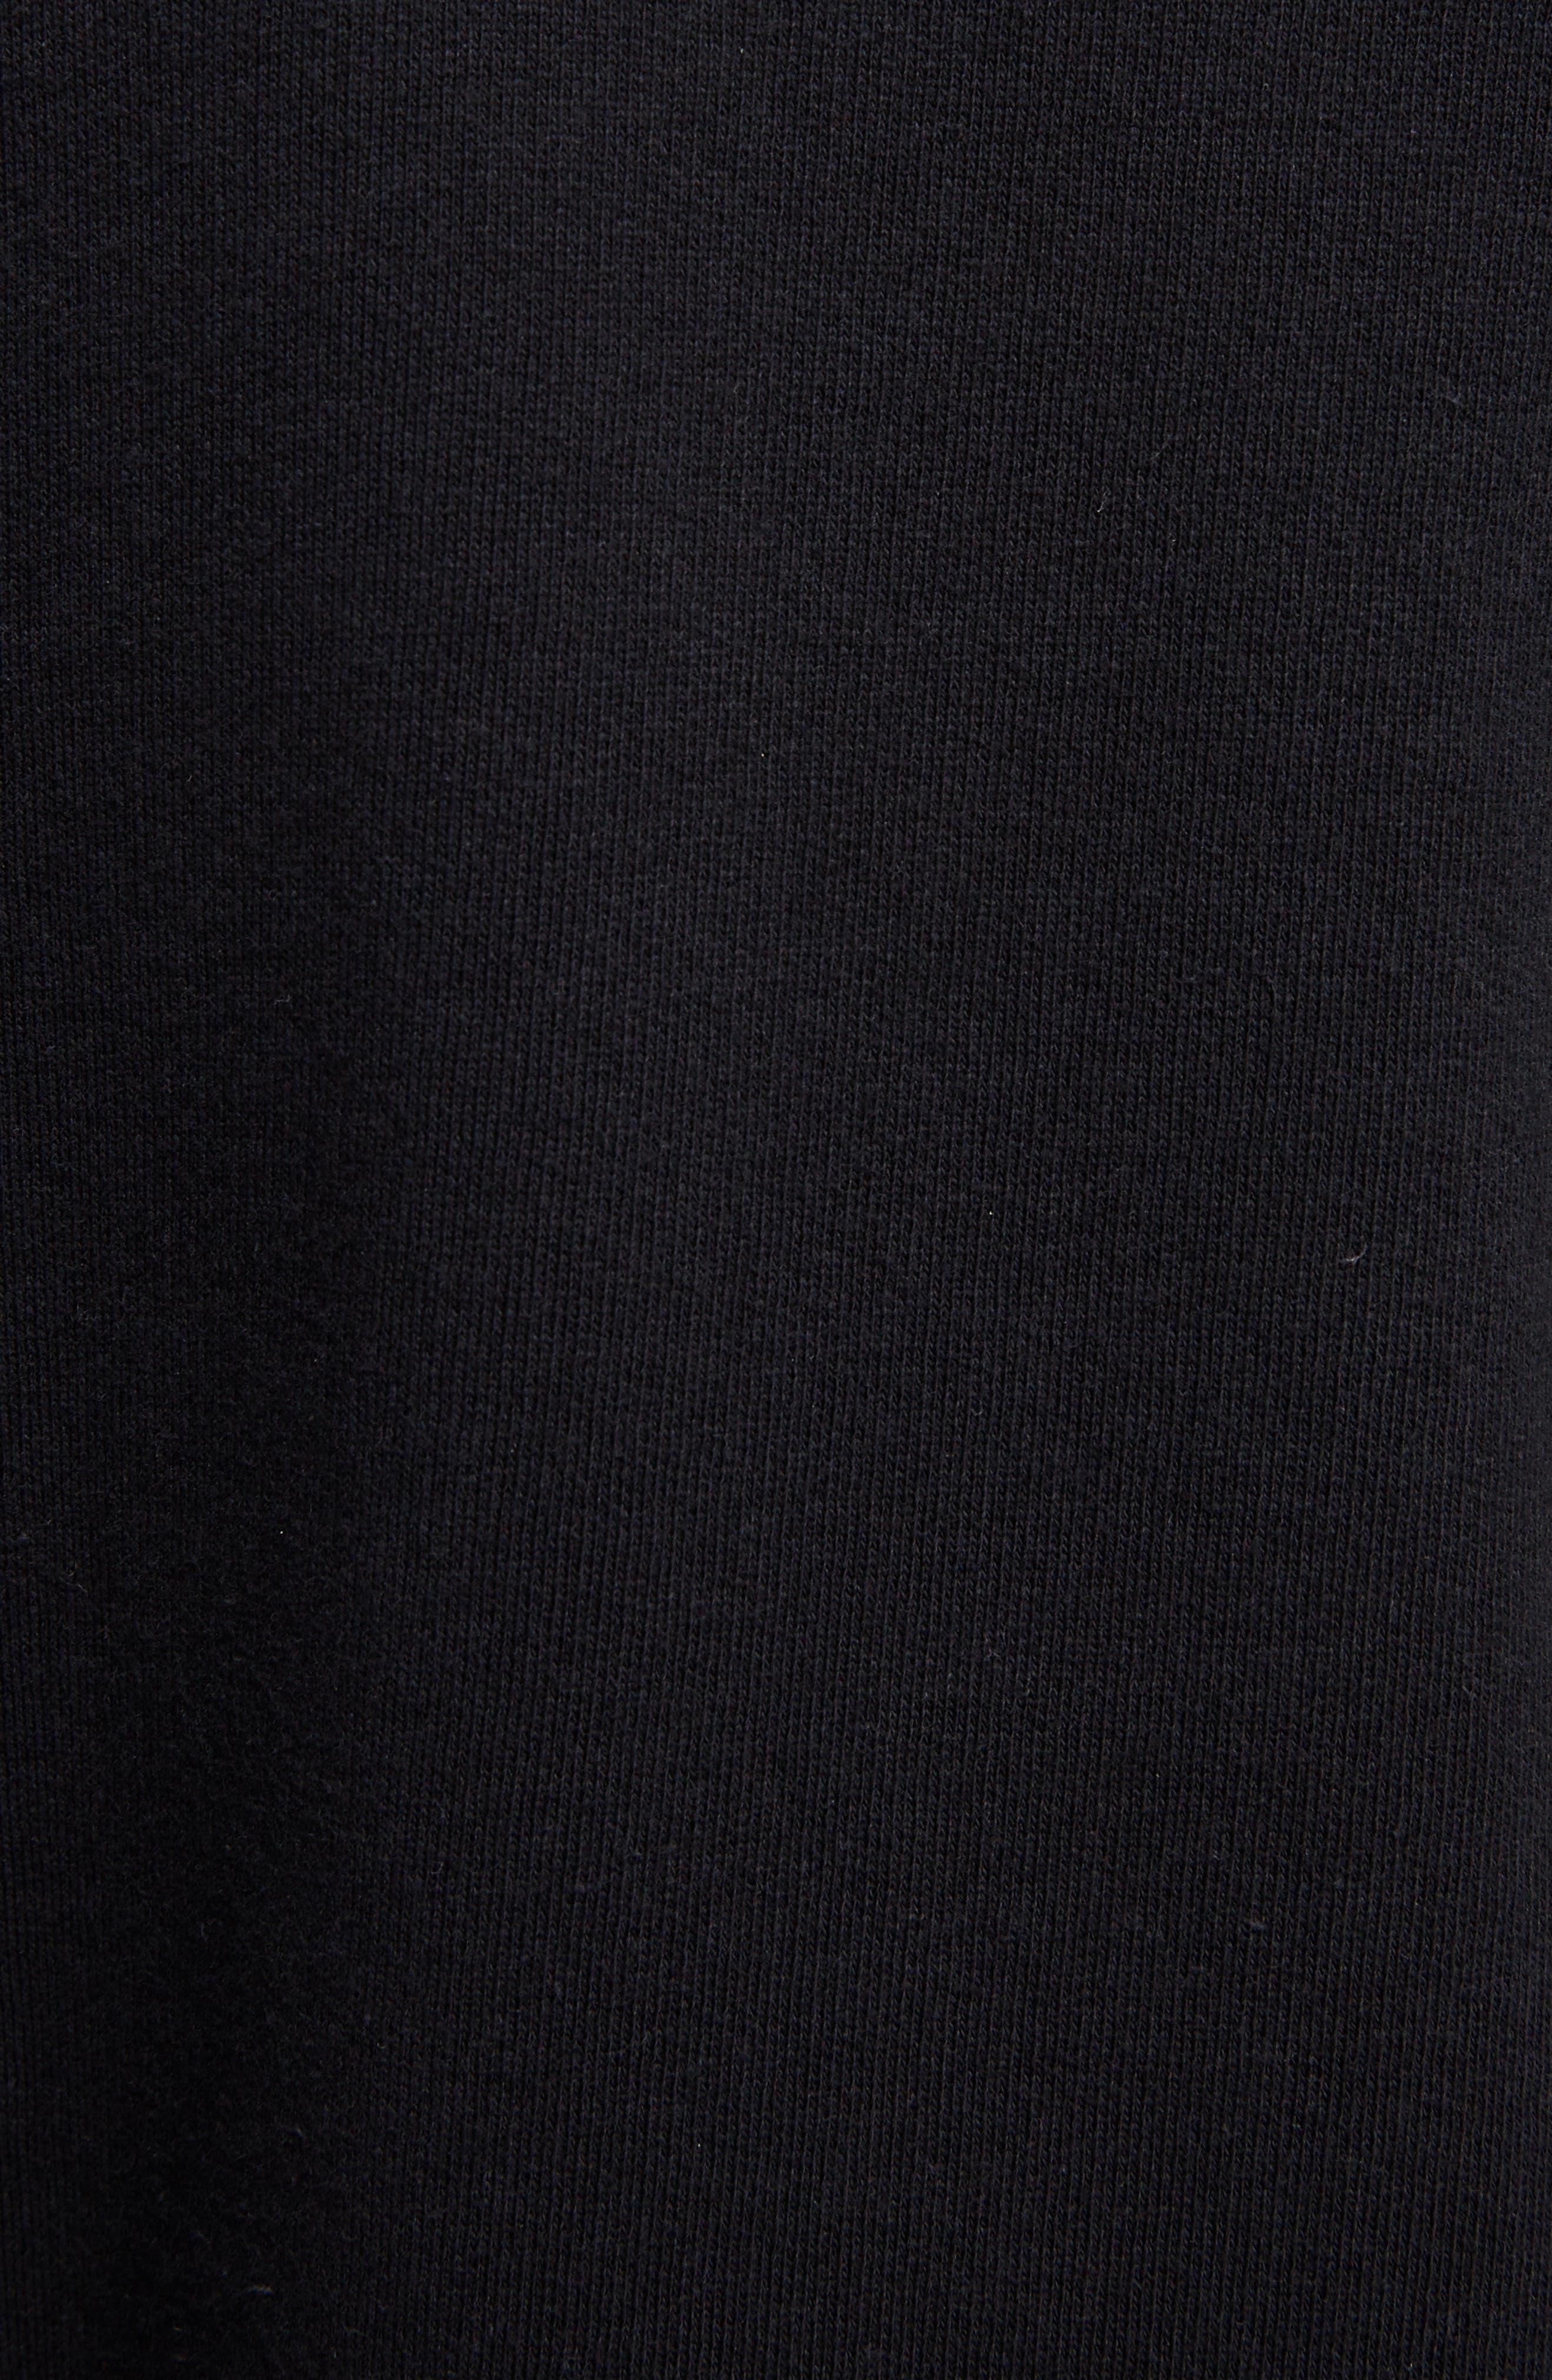 Oslavi Embroidered Moose Sweatshirt,                             Alternate thumbnail 5, color,                             001